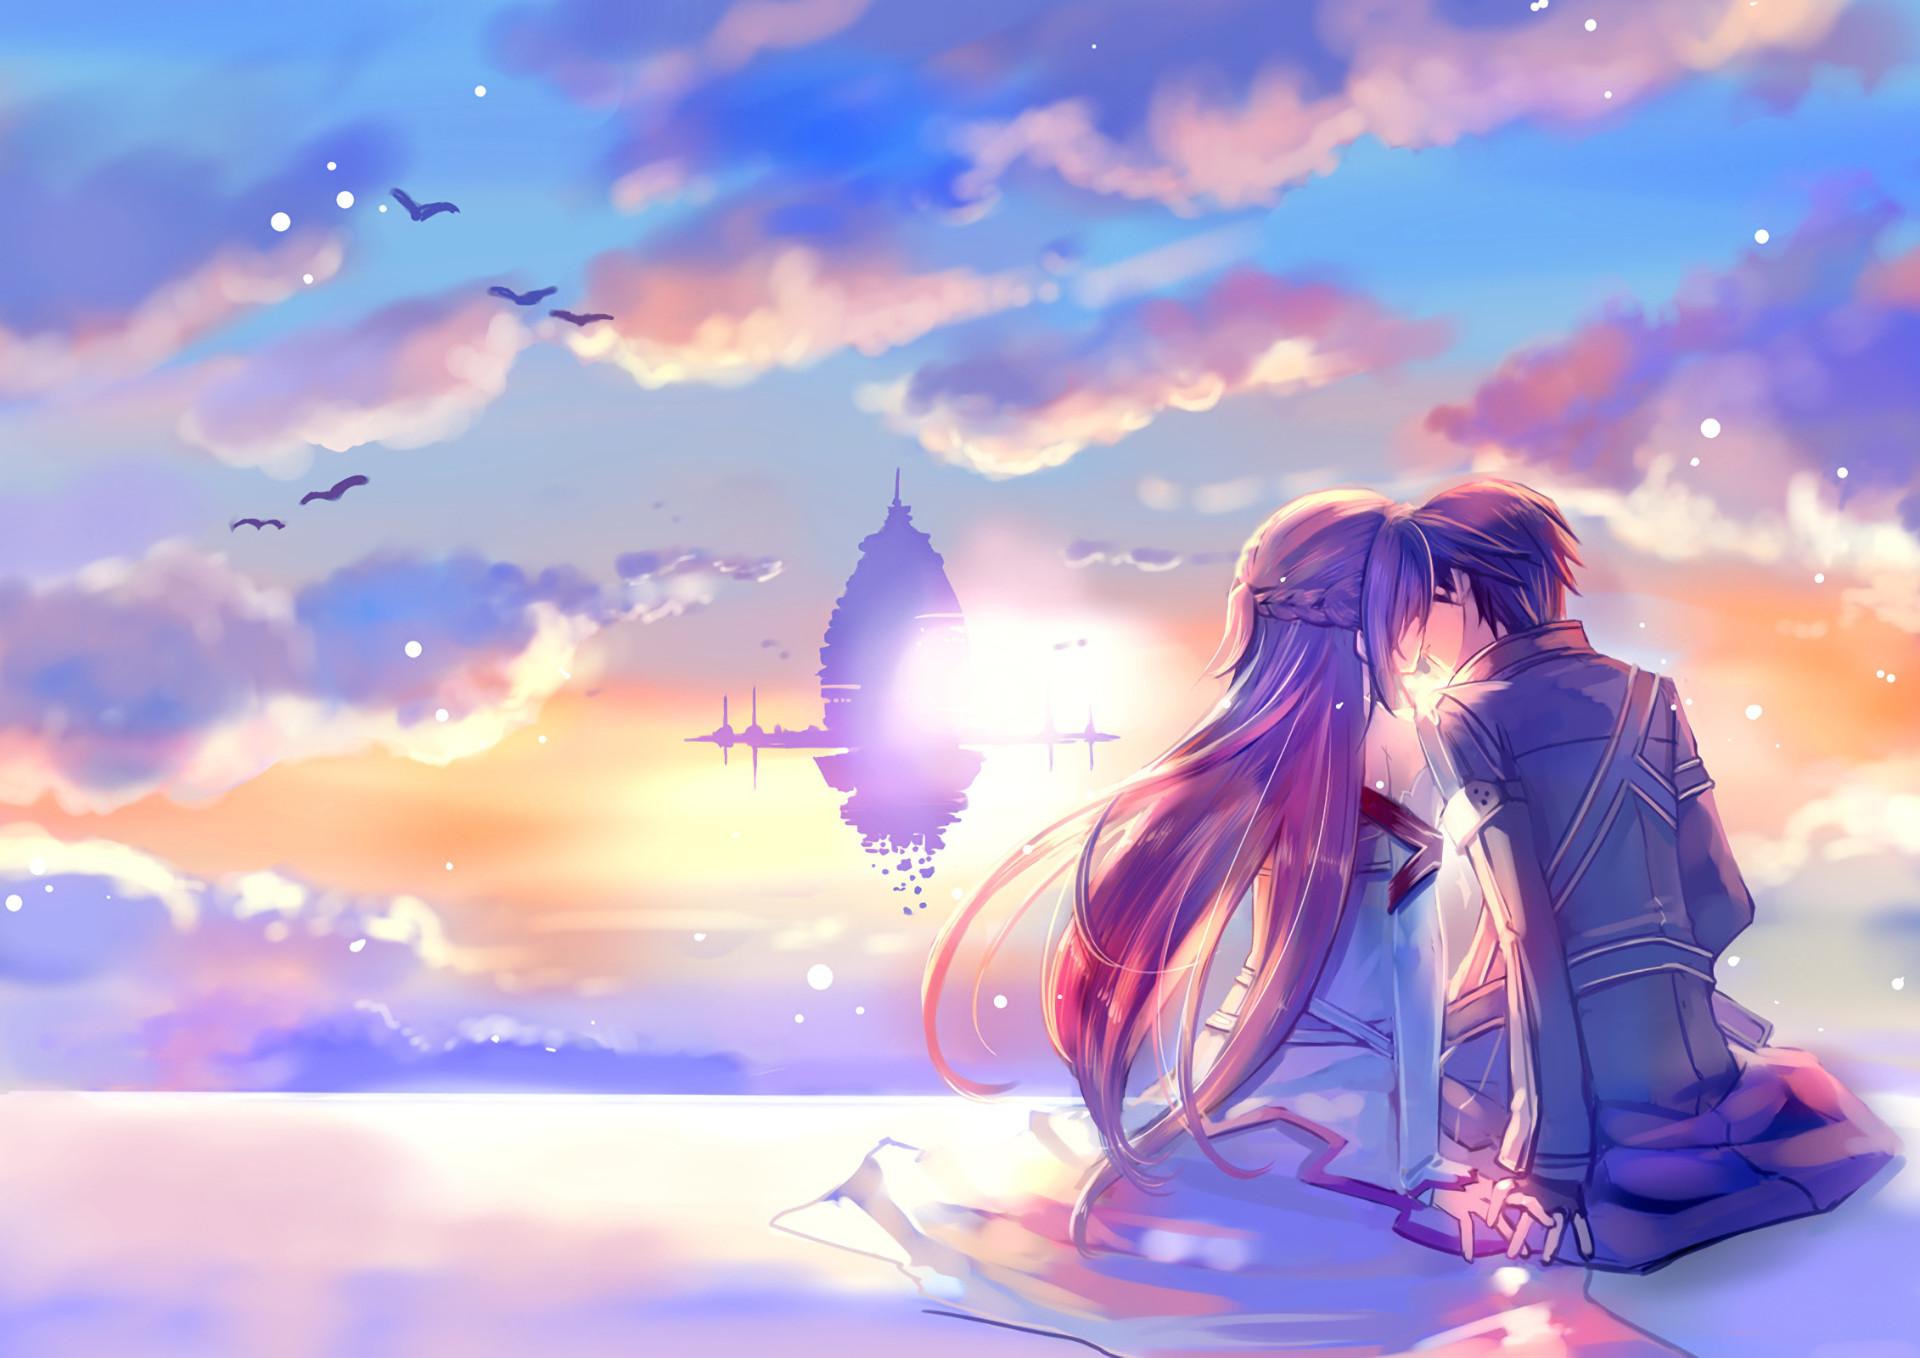 … Sword Art Online Yui · HD Wallpaper | Hintergrund ID:314574